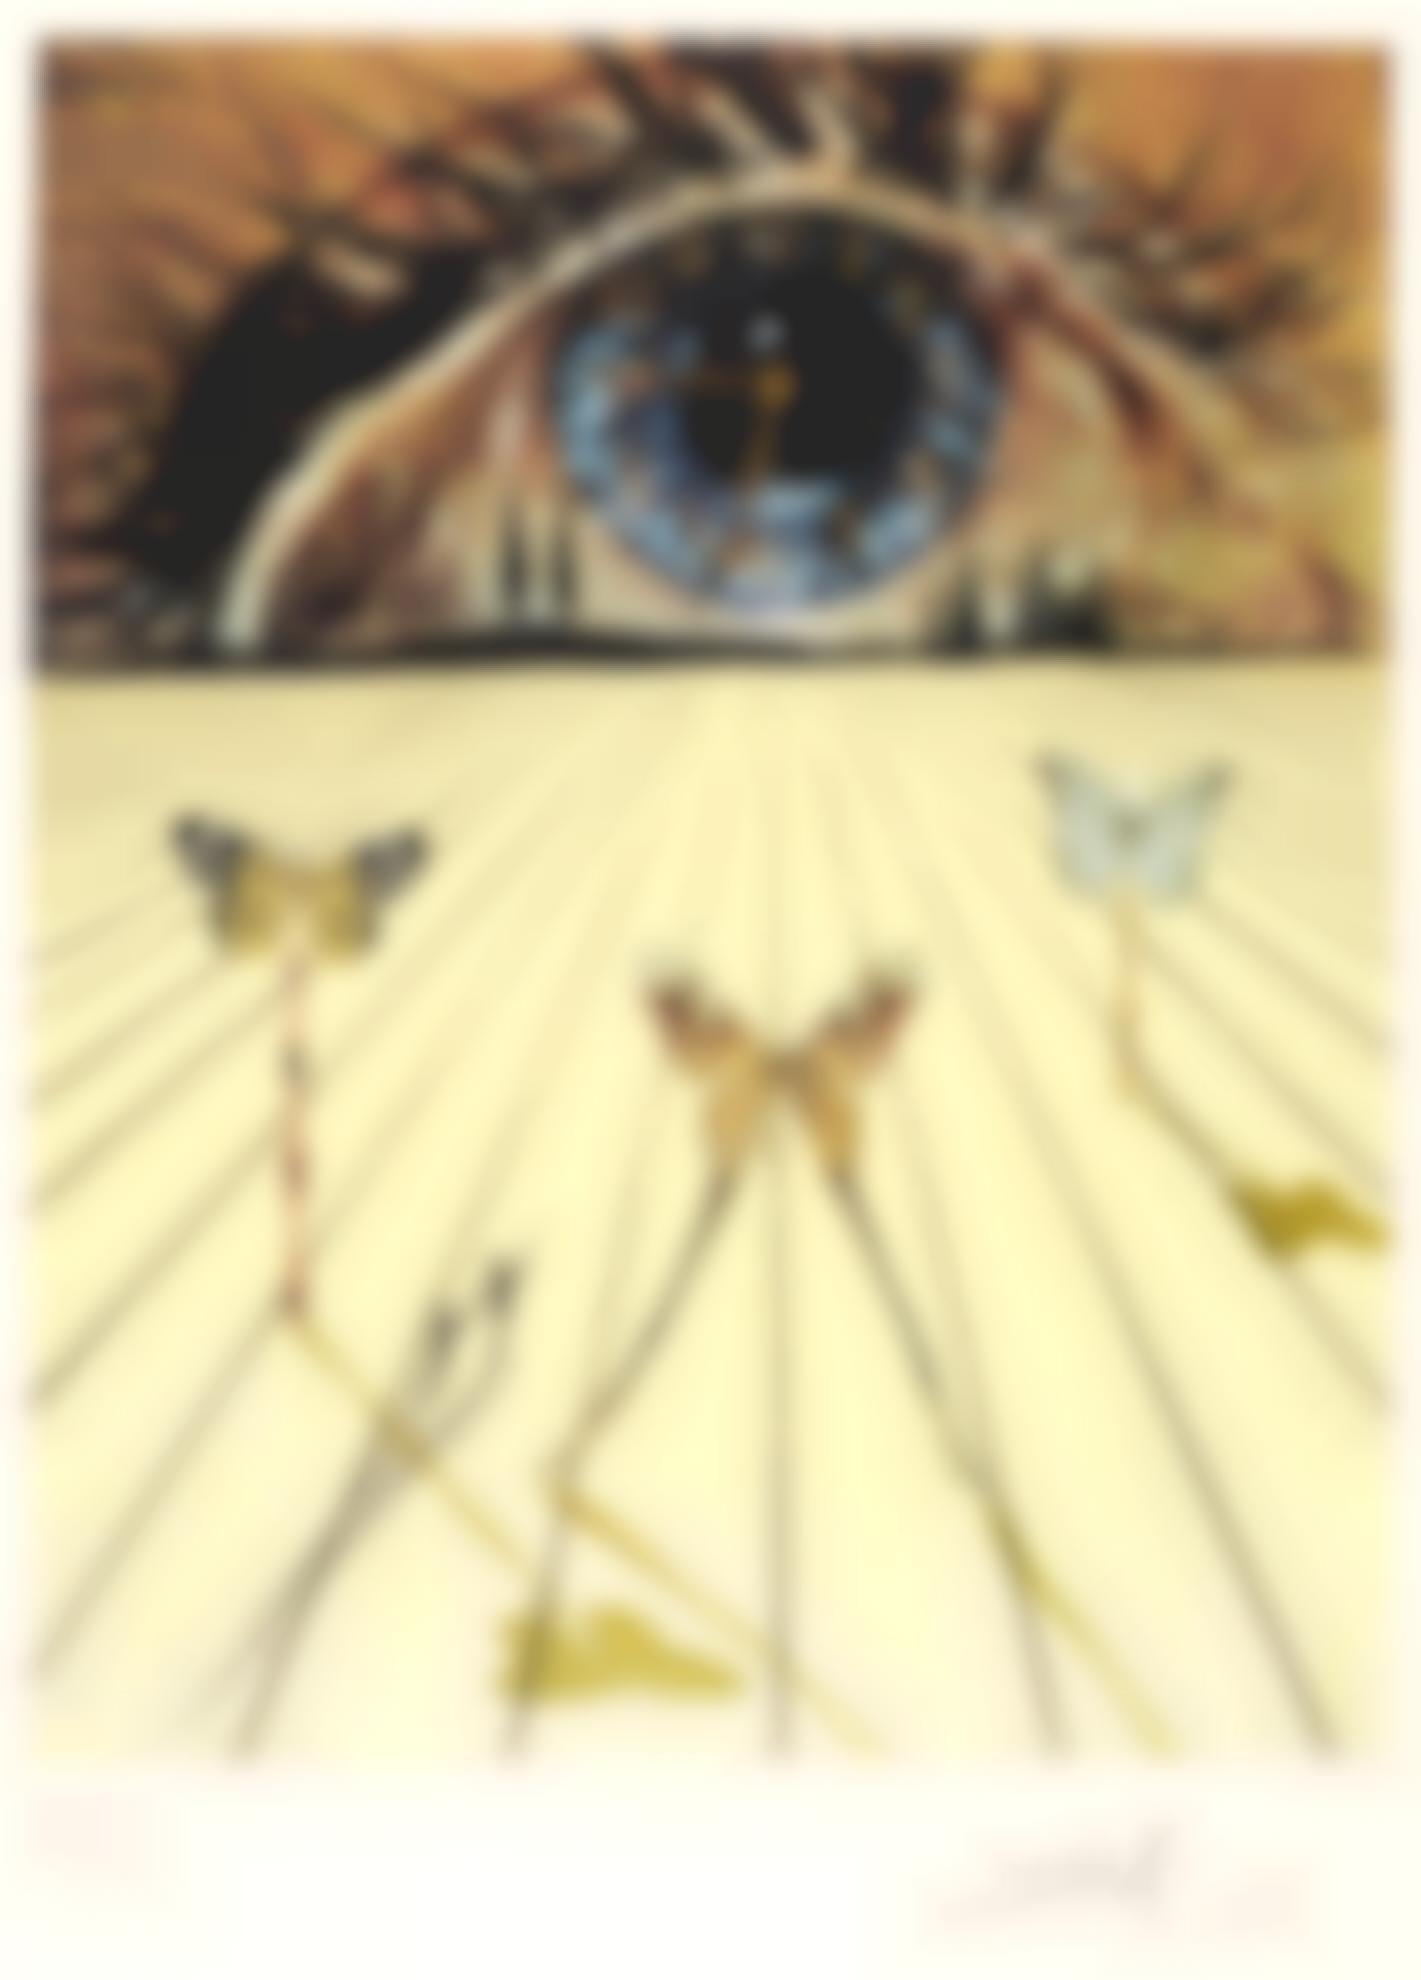 Salvador Dali-Memories Of Surrealism (Michler & Lopsinger 494-505)-1971